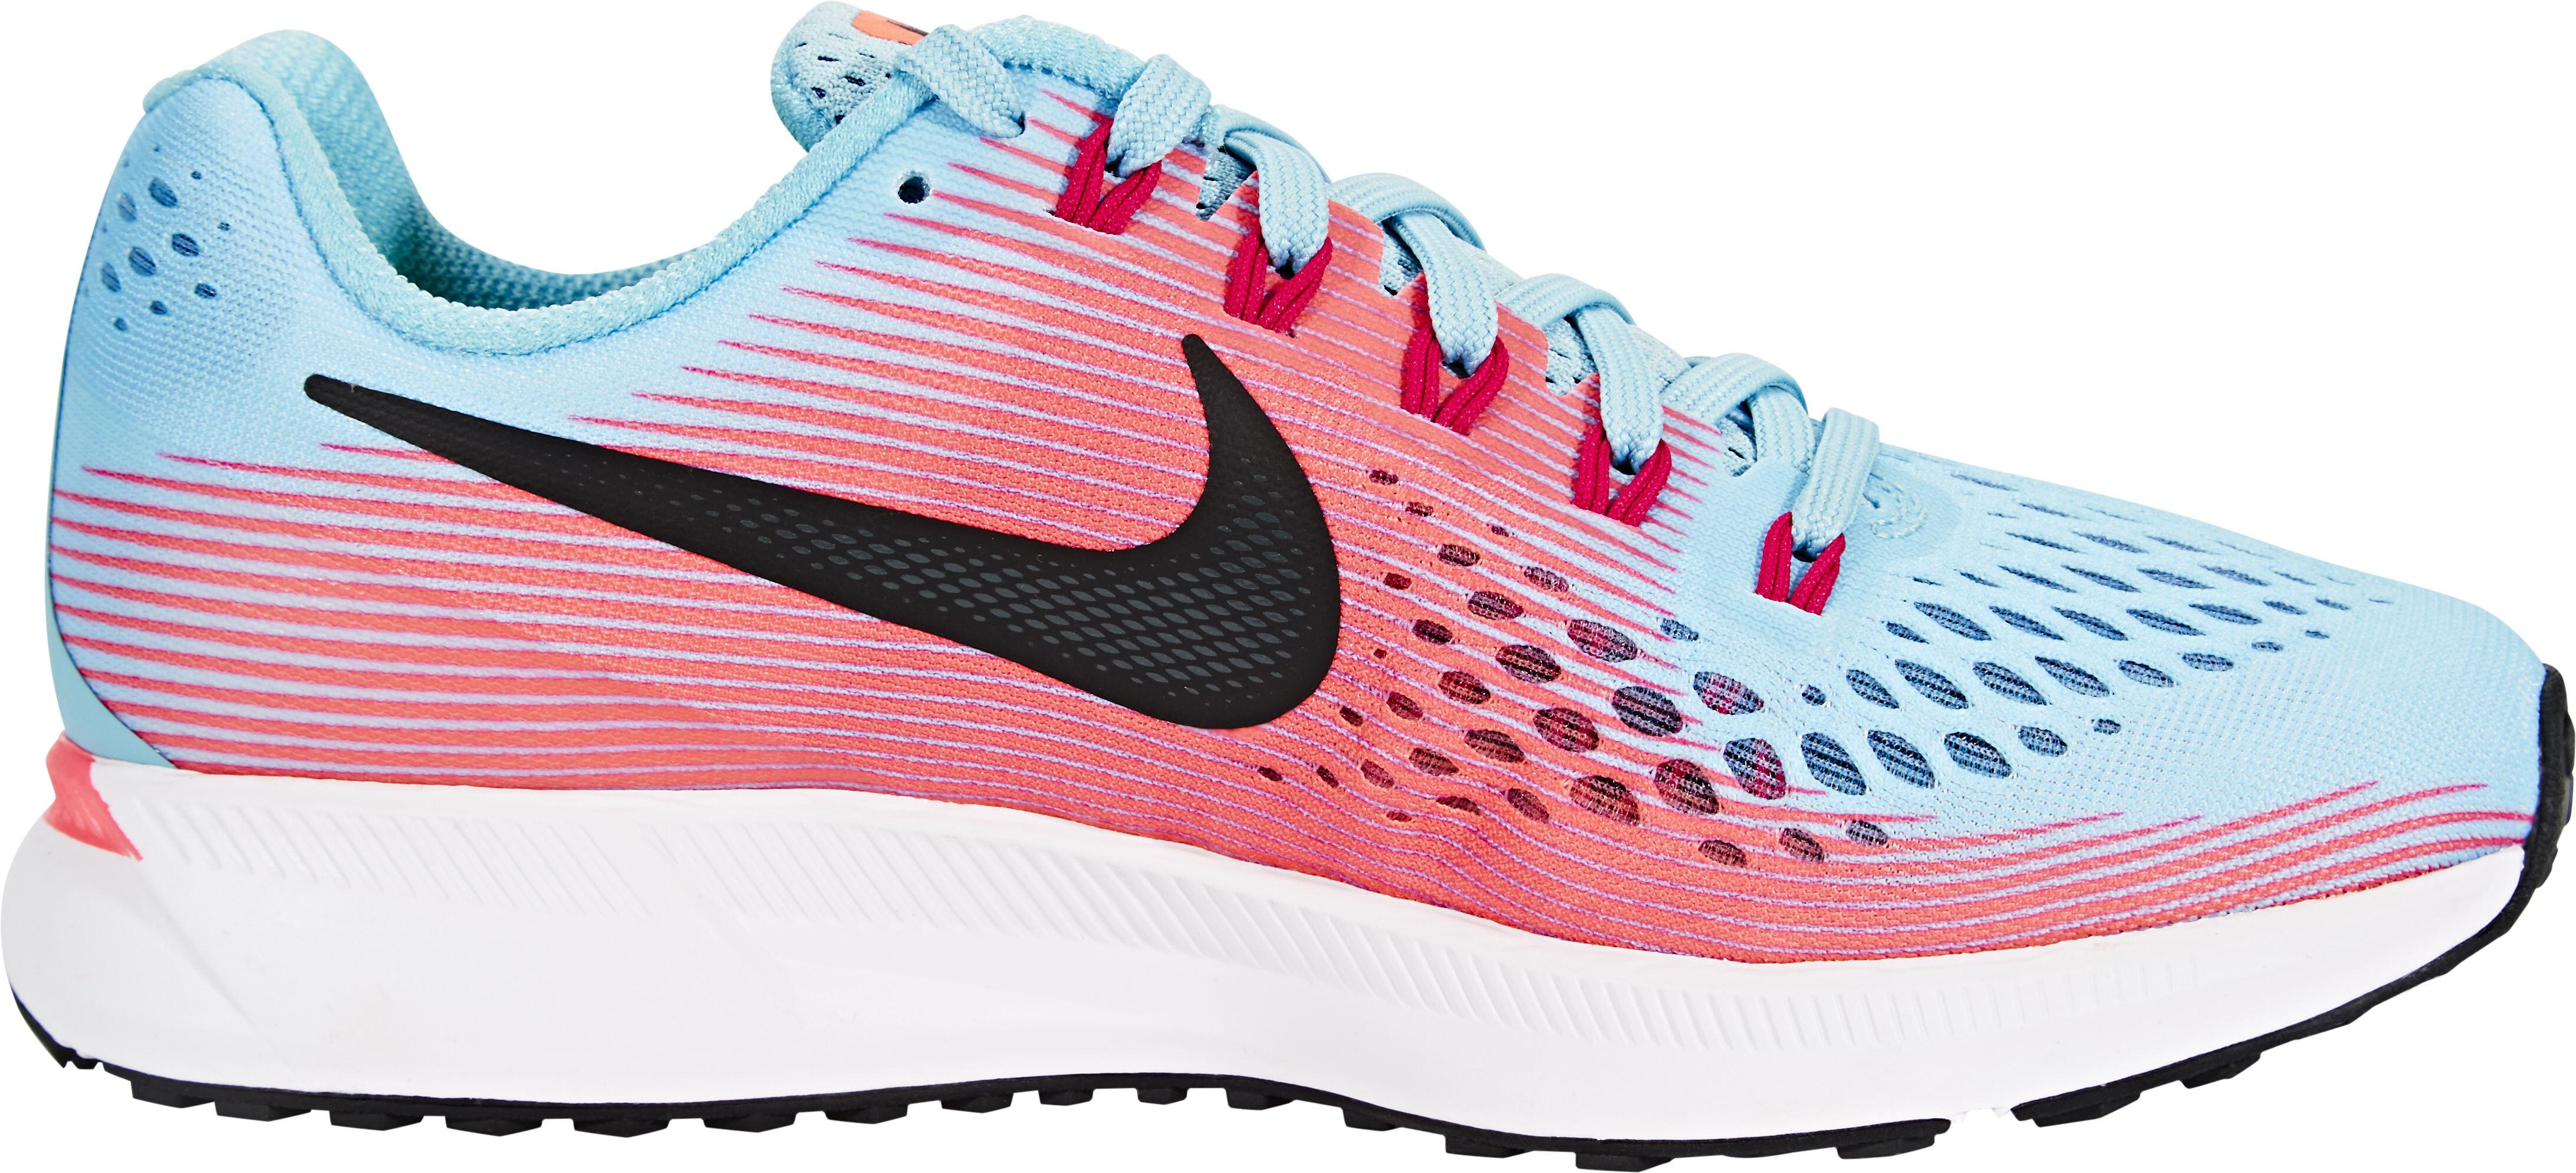 newest 165b3 0cee0 nike air pegasus running shoes pink dress code